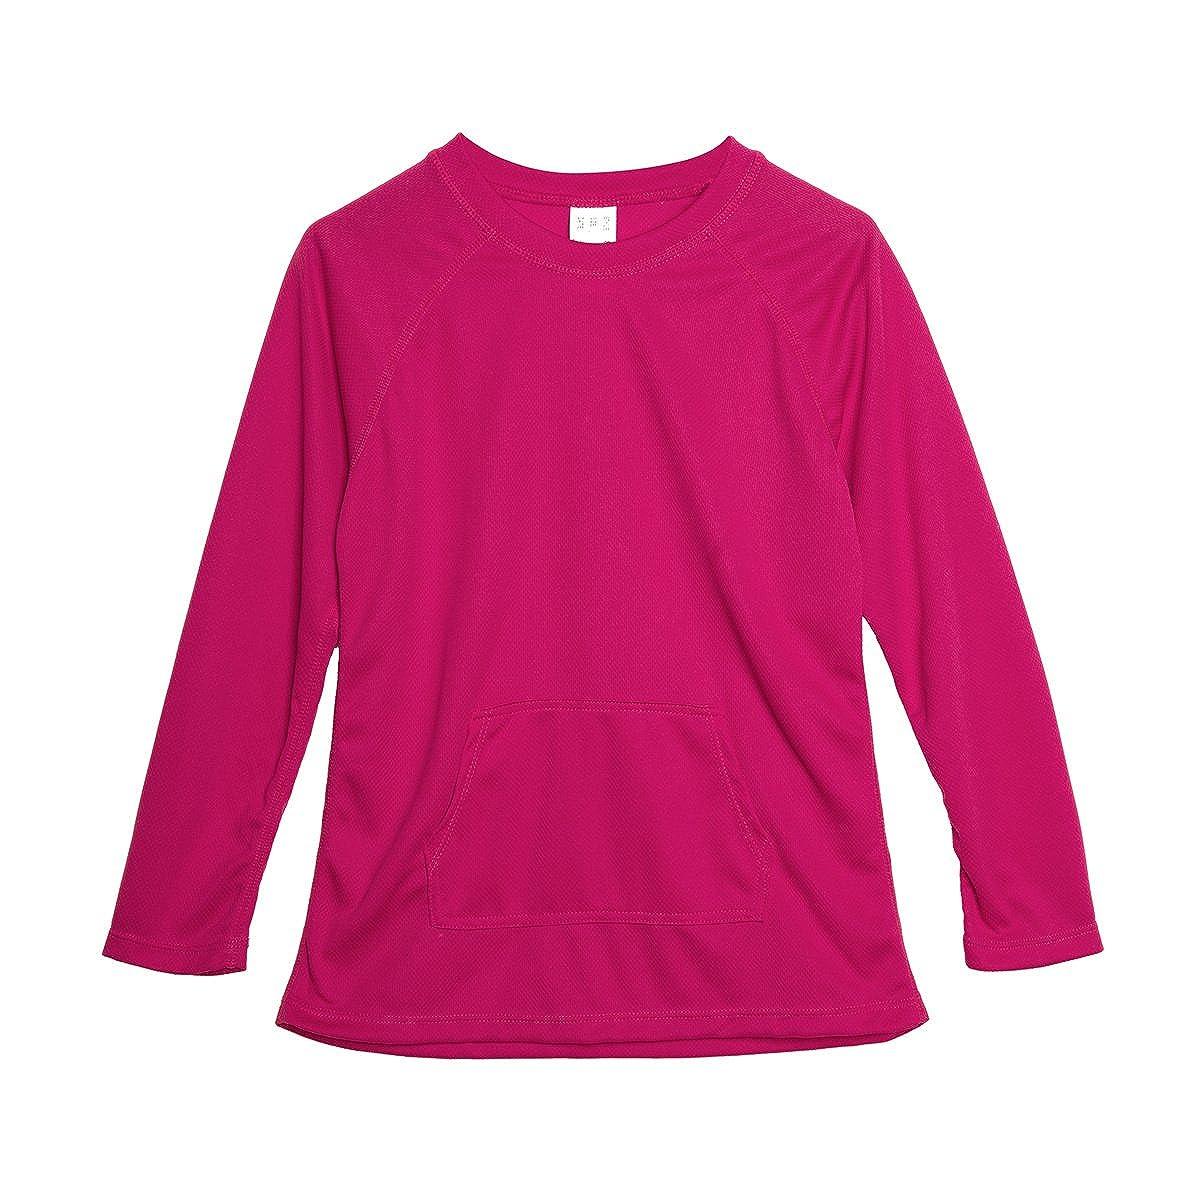 beautyin Boys Girls Long Sleeve Swim Shirt Athletic Solid Rashguard UPF Sun Protection